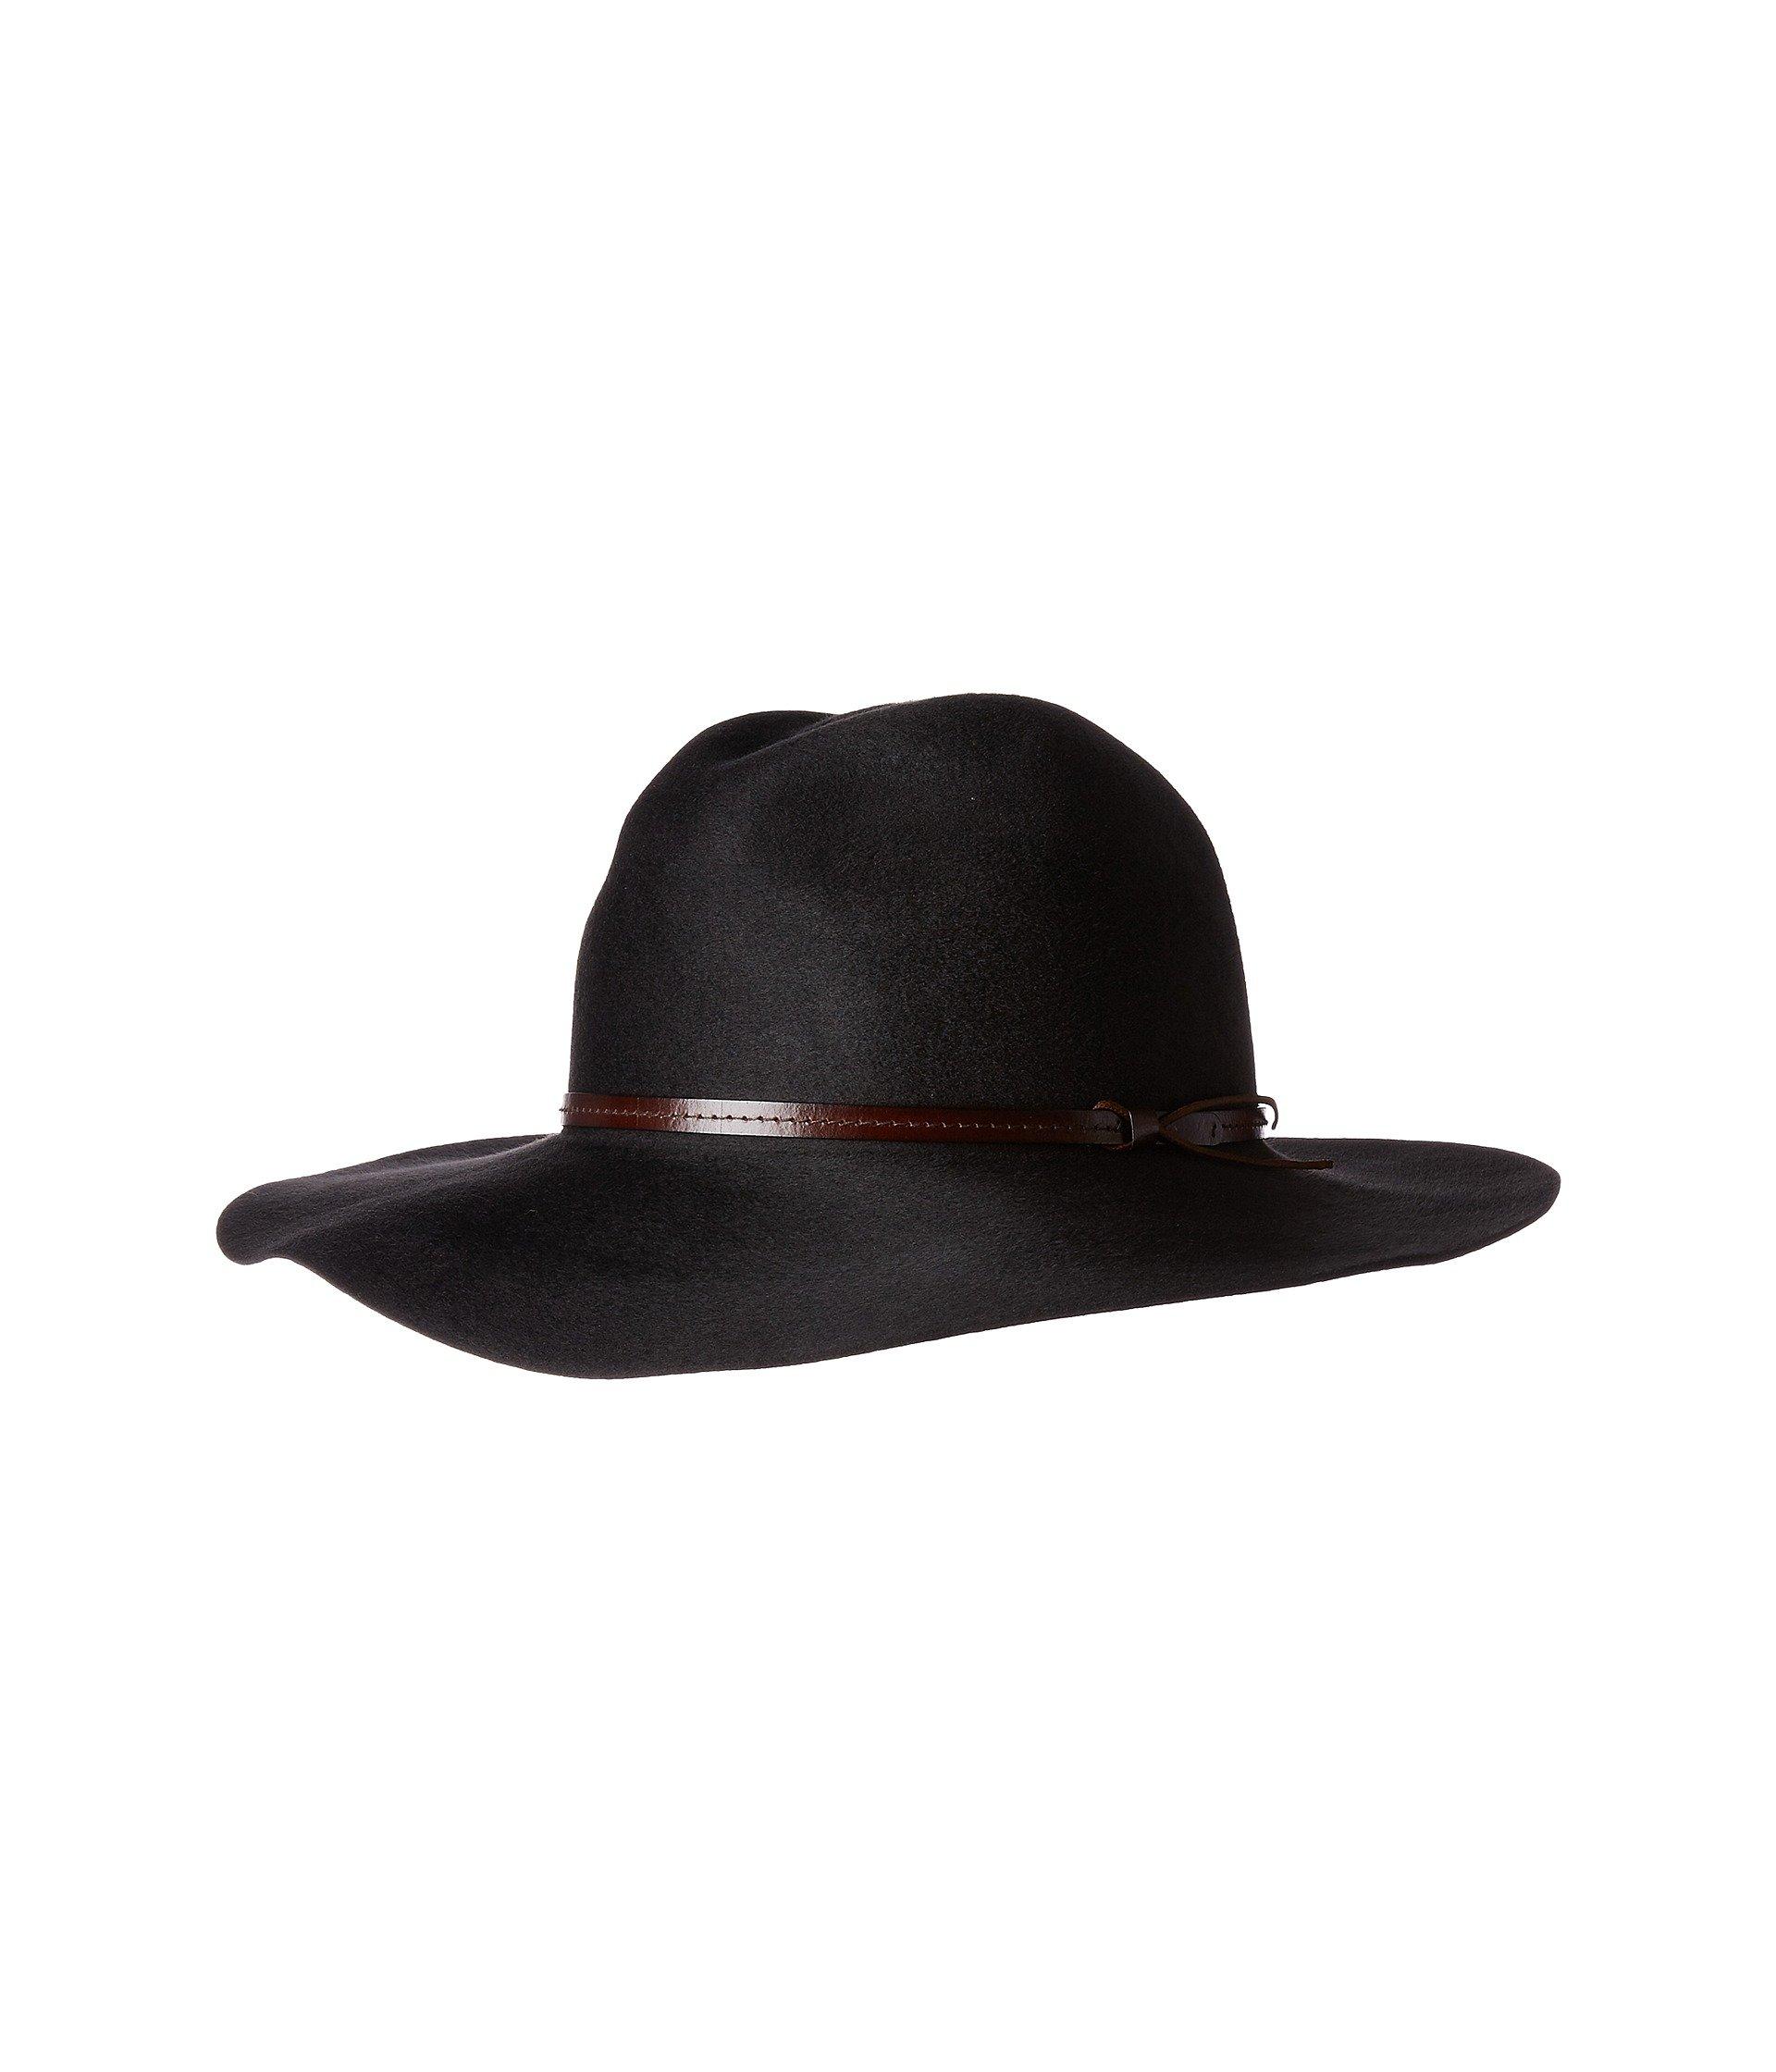 Pendleton Women's Marni Fedora Hat, Windsor, Small/Medium